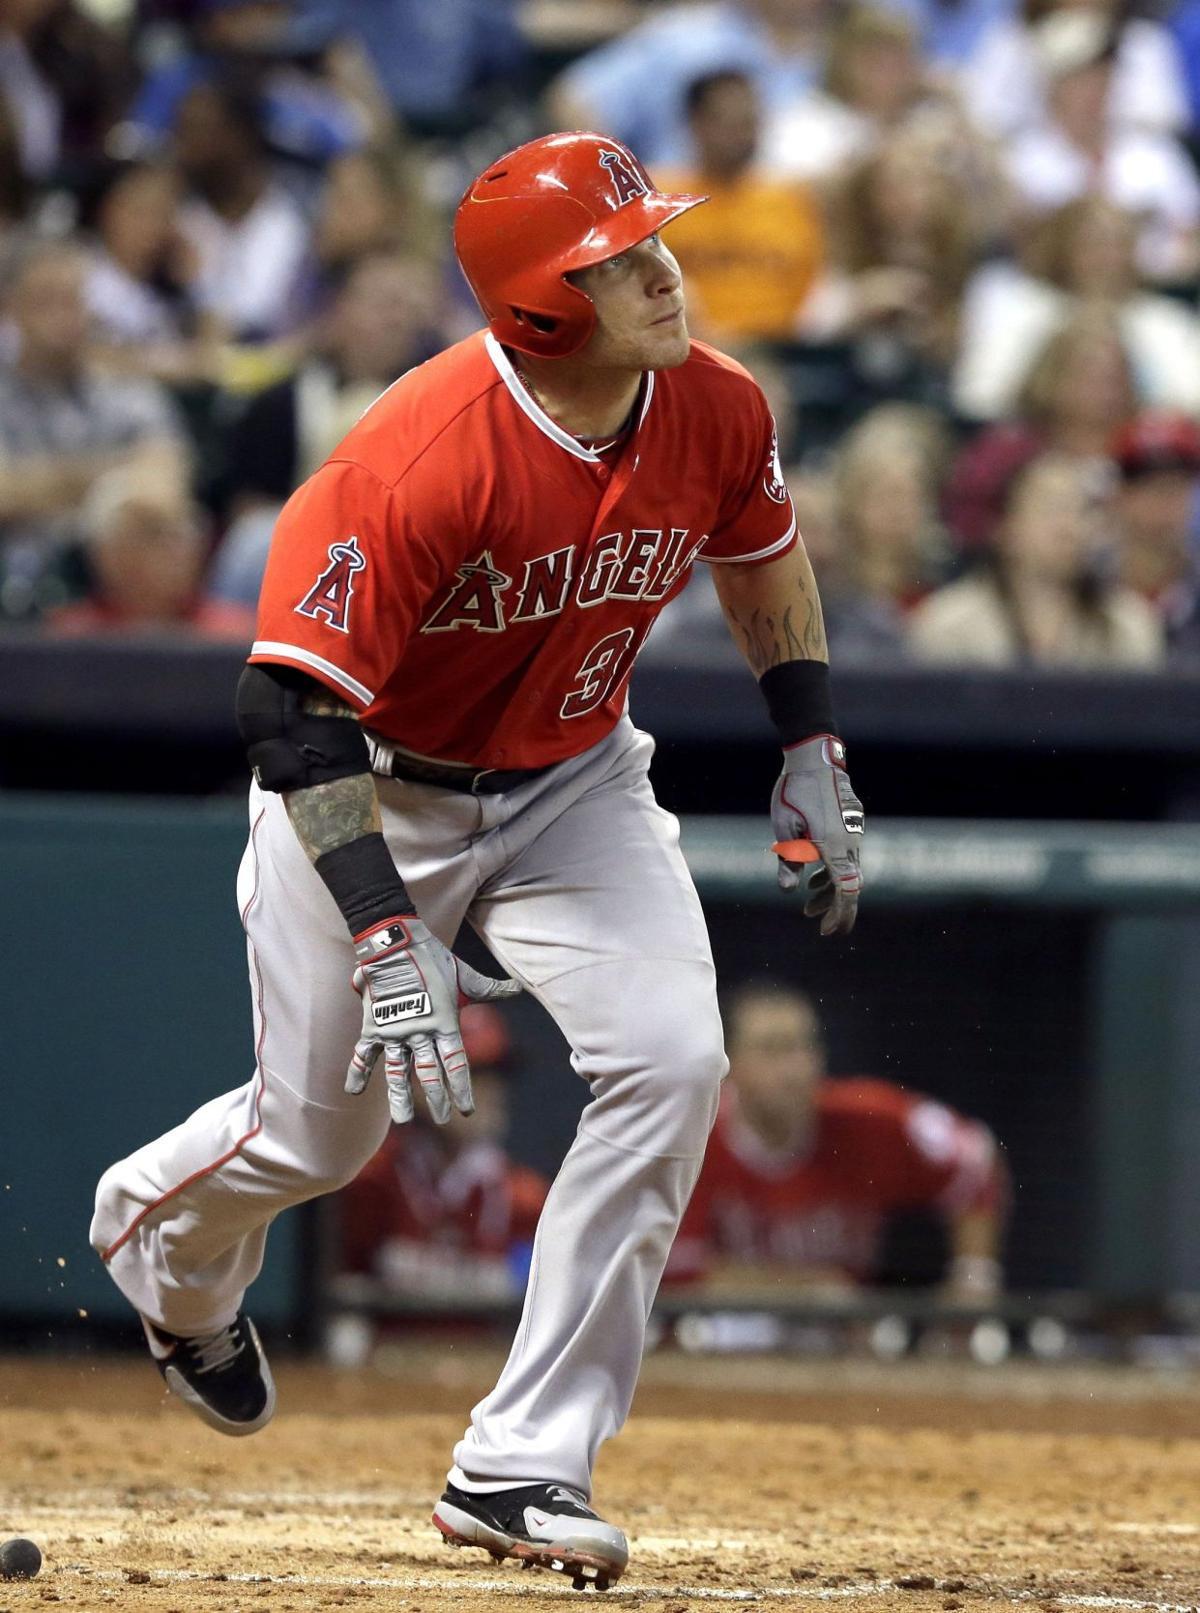 Major League Baseball should reconsider breakaway bases